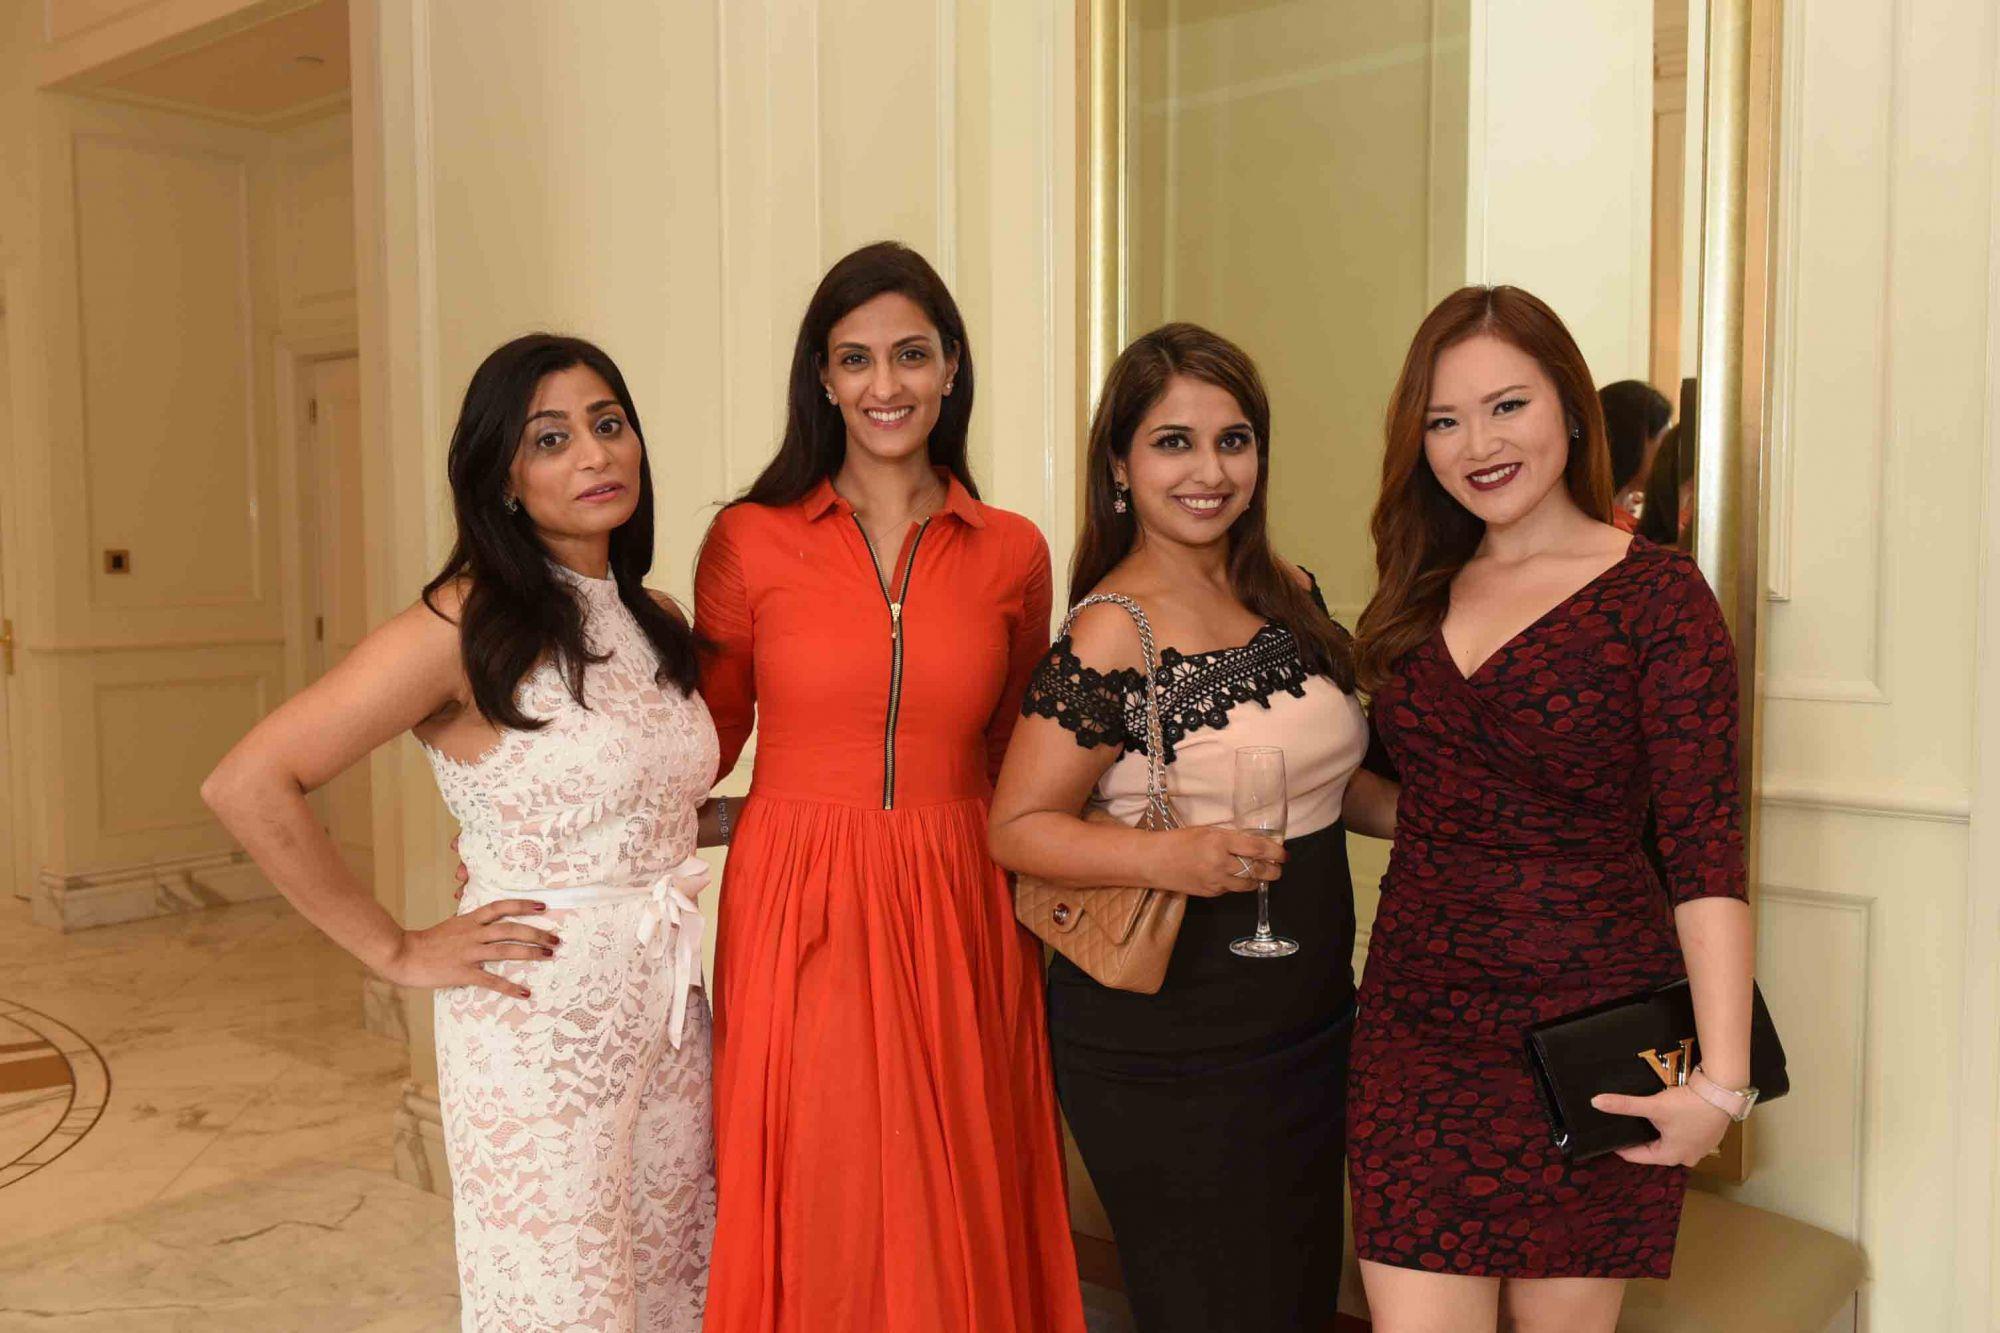 Seema Bhojwani, Shireena Shroff, Sunita Gill, Sabrina Hunter